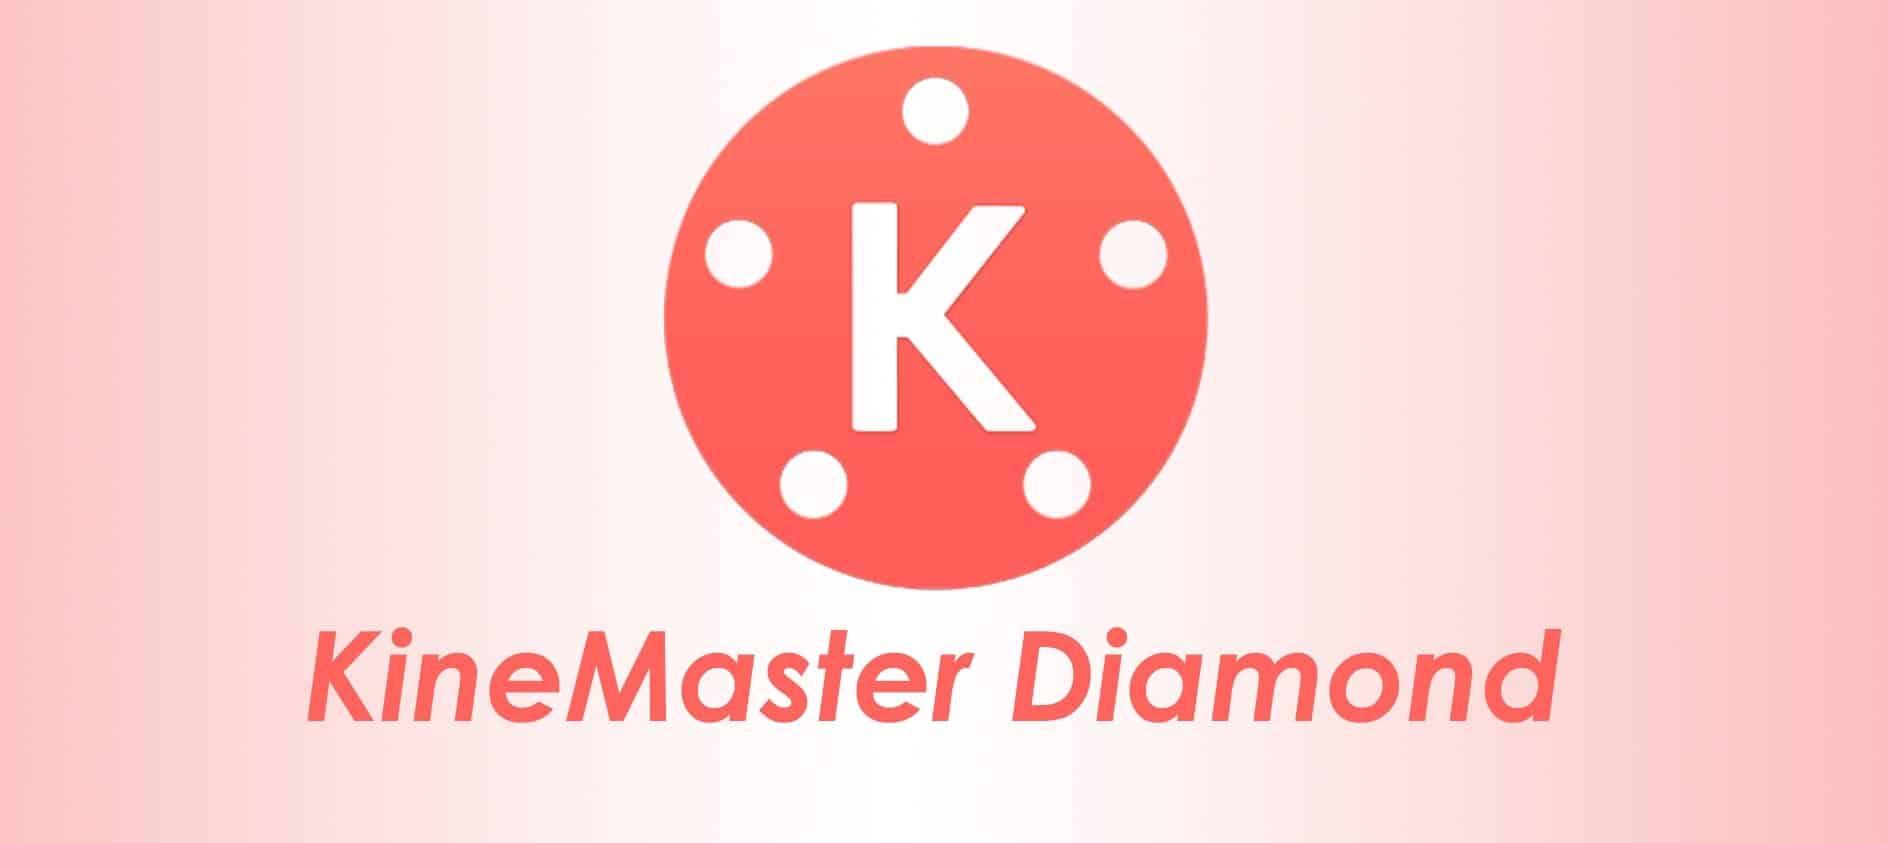 Perbandingan-Kinemaster-Diamond-vs-Kimemaster-Resmi